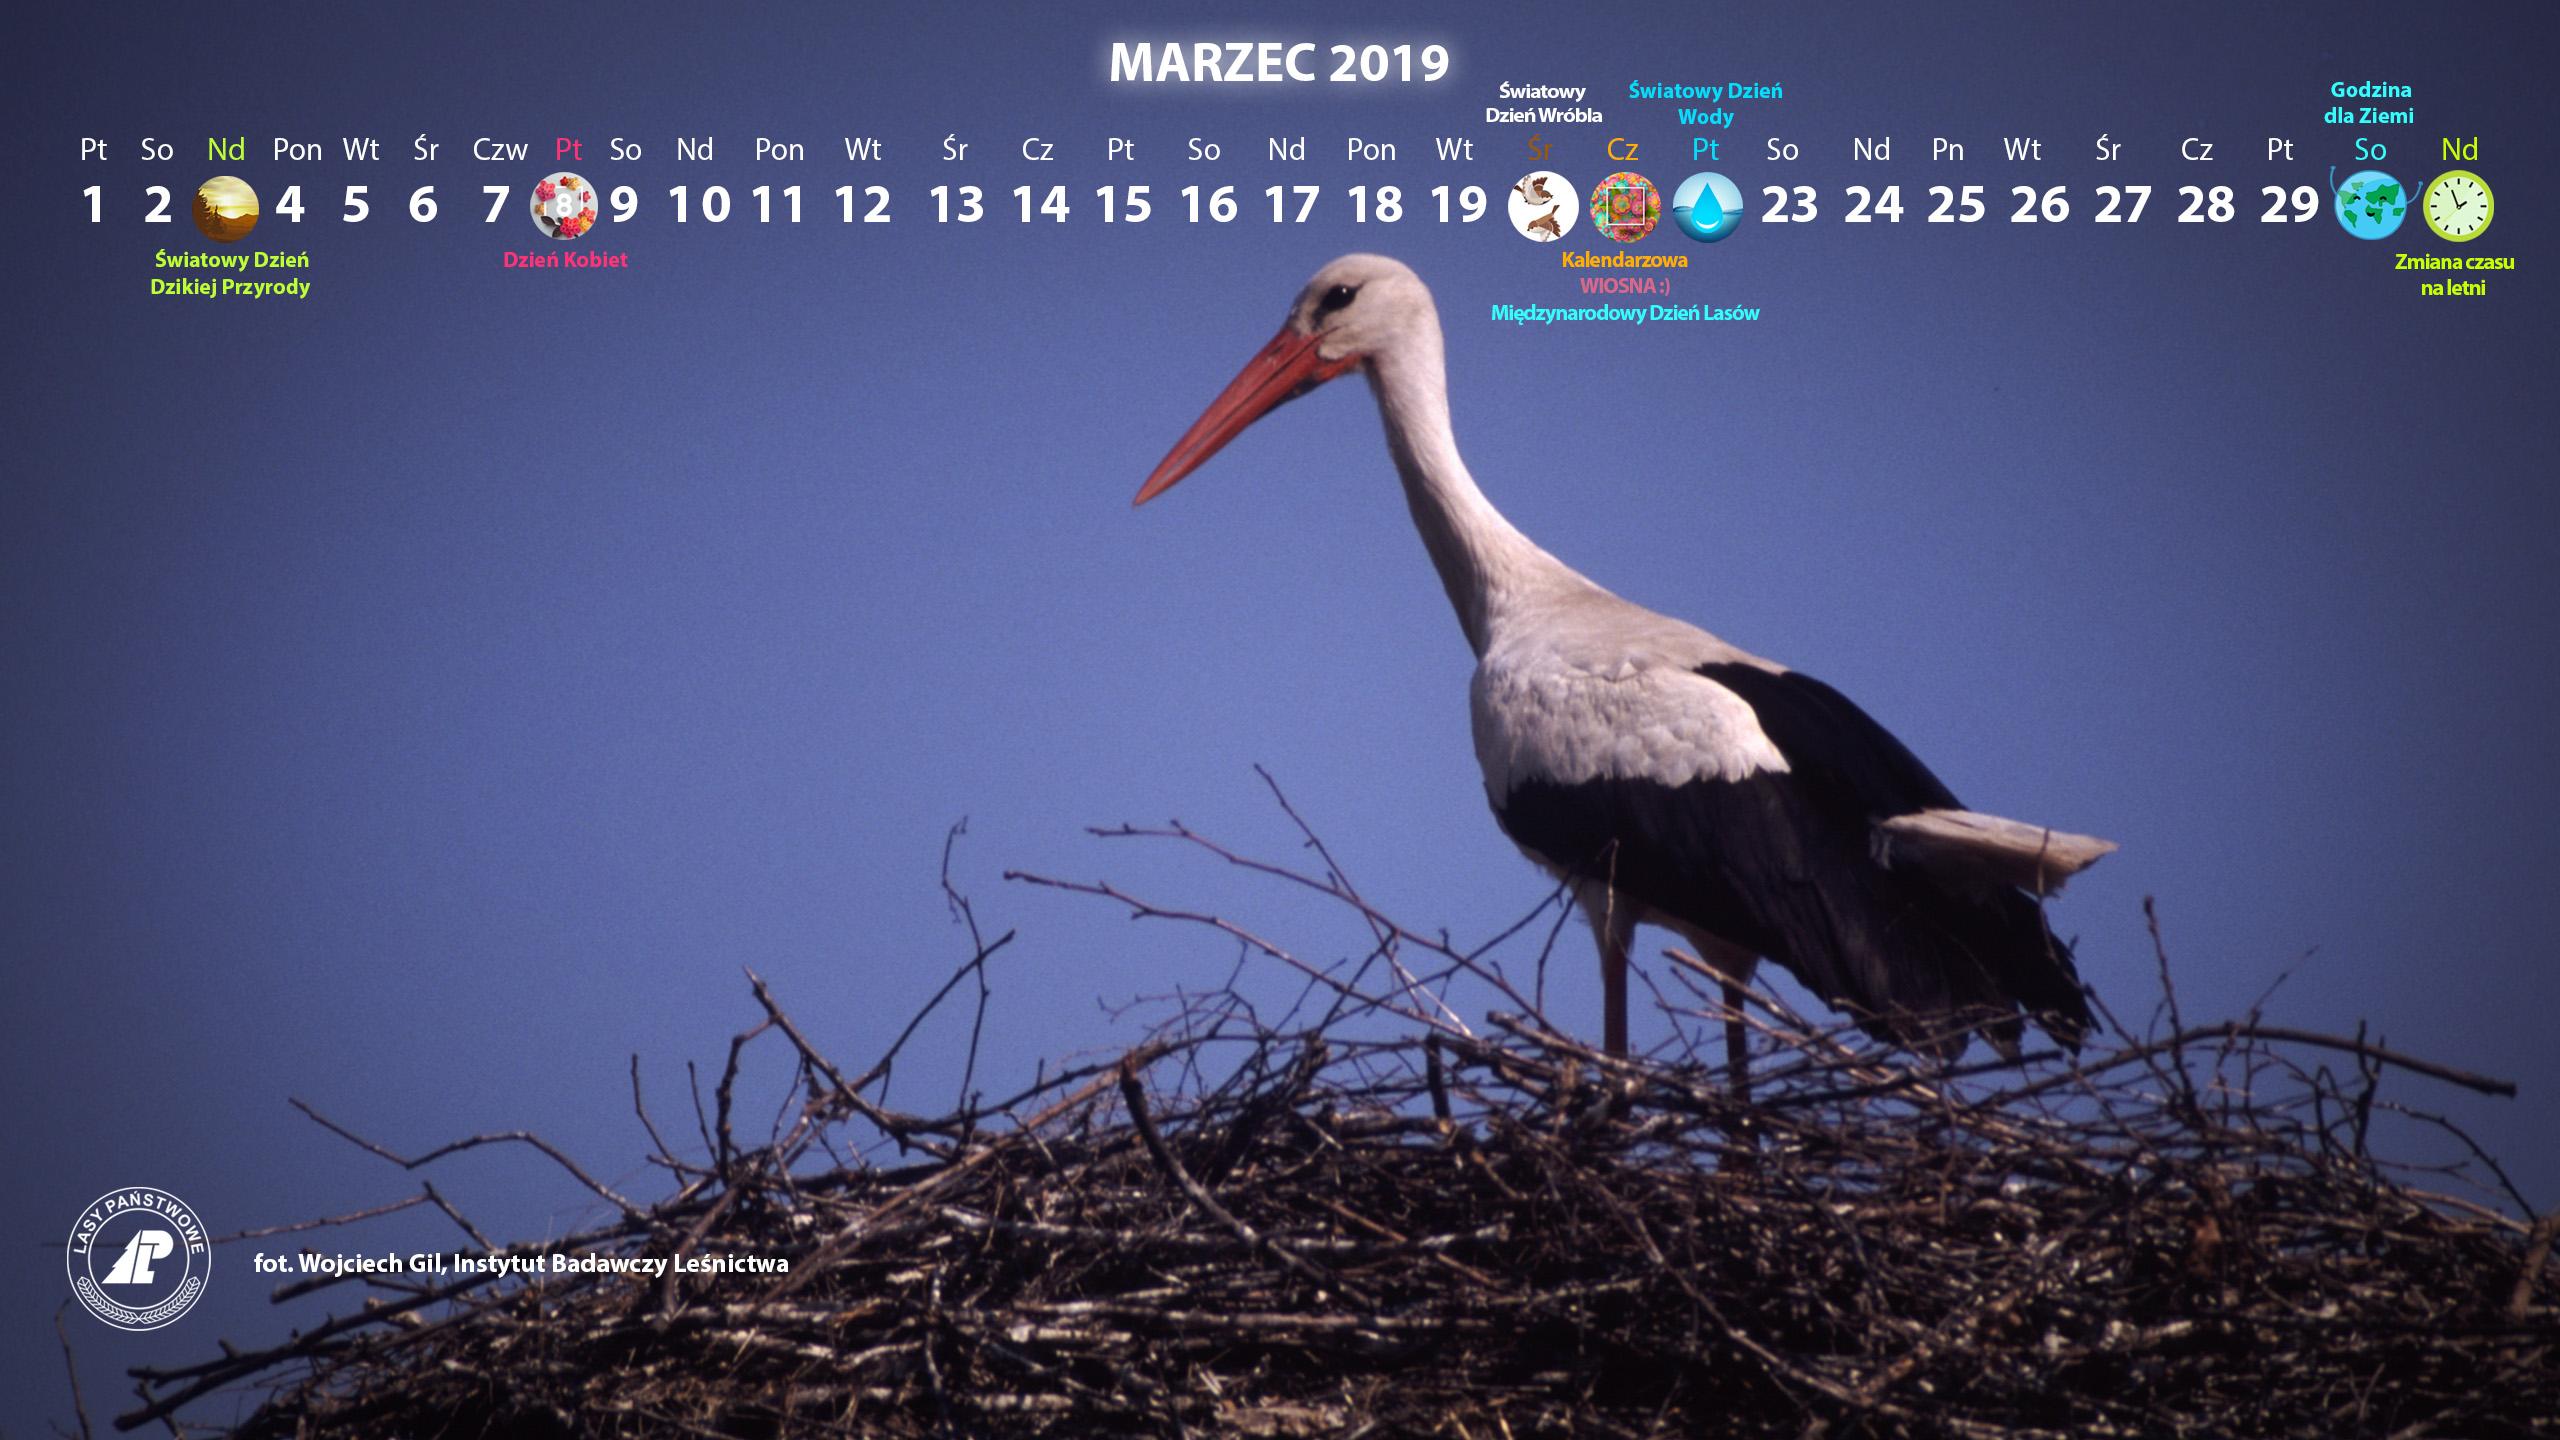 Kalendarz_marzec_2019_2560x1440[1].jpg